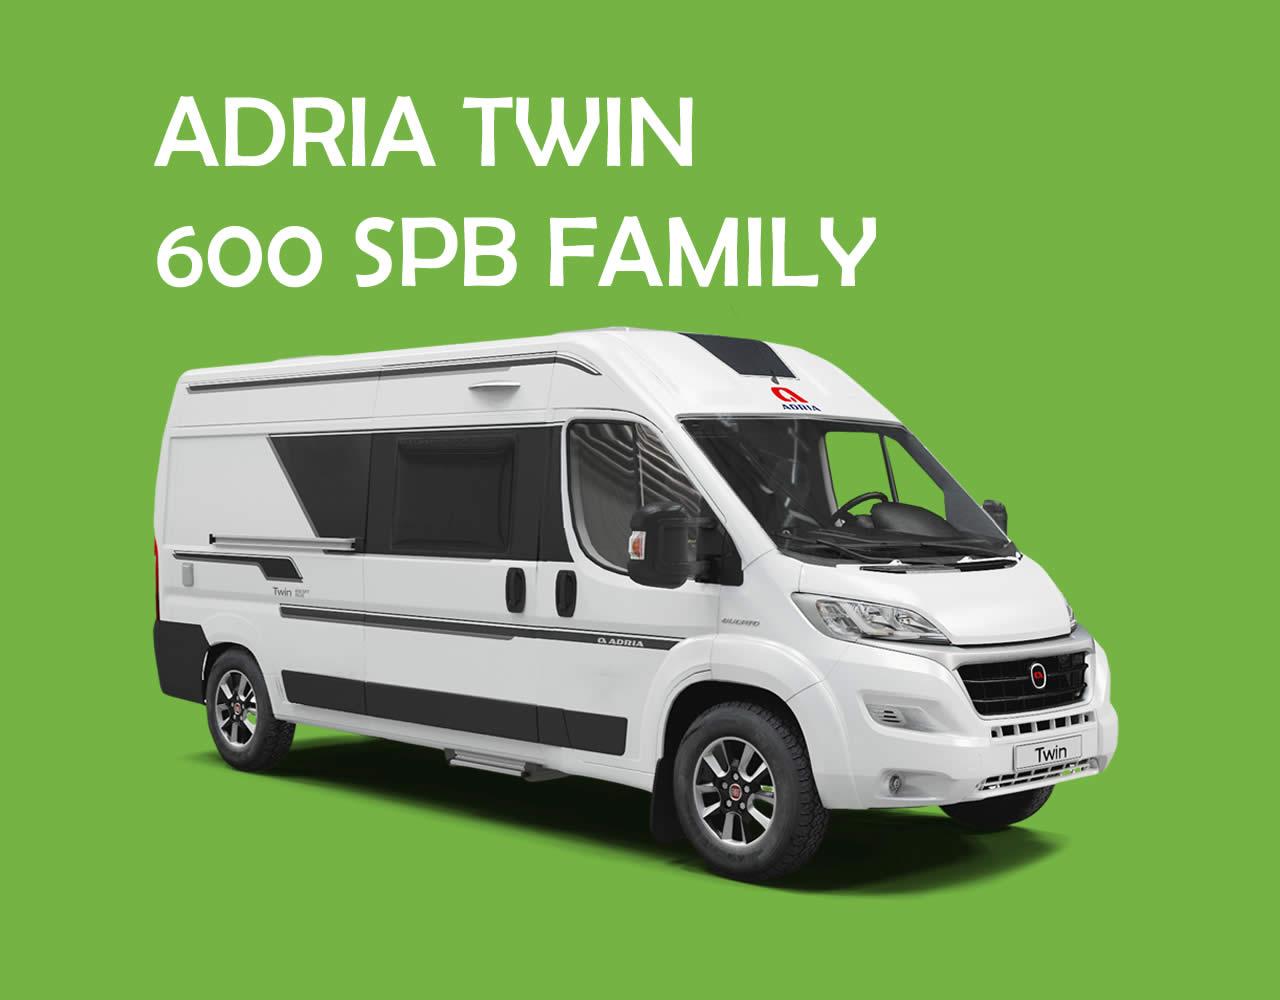 Alquilar Furgoneta Camper Adria Twin 600 SPB Family en Pontevedra - Boa Vila Caravaning